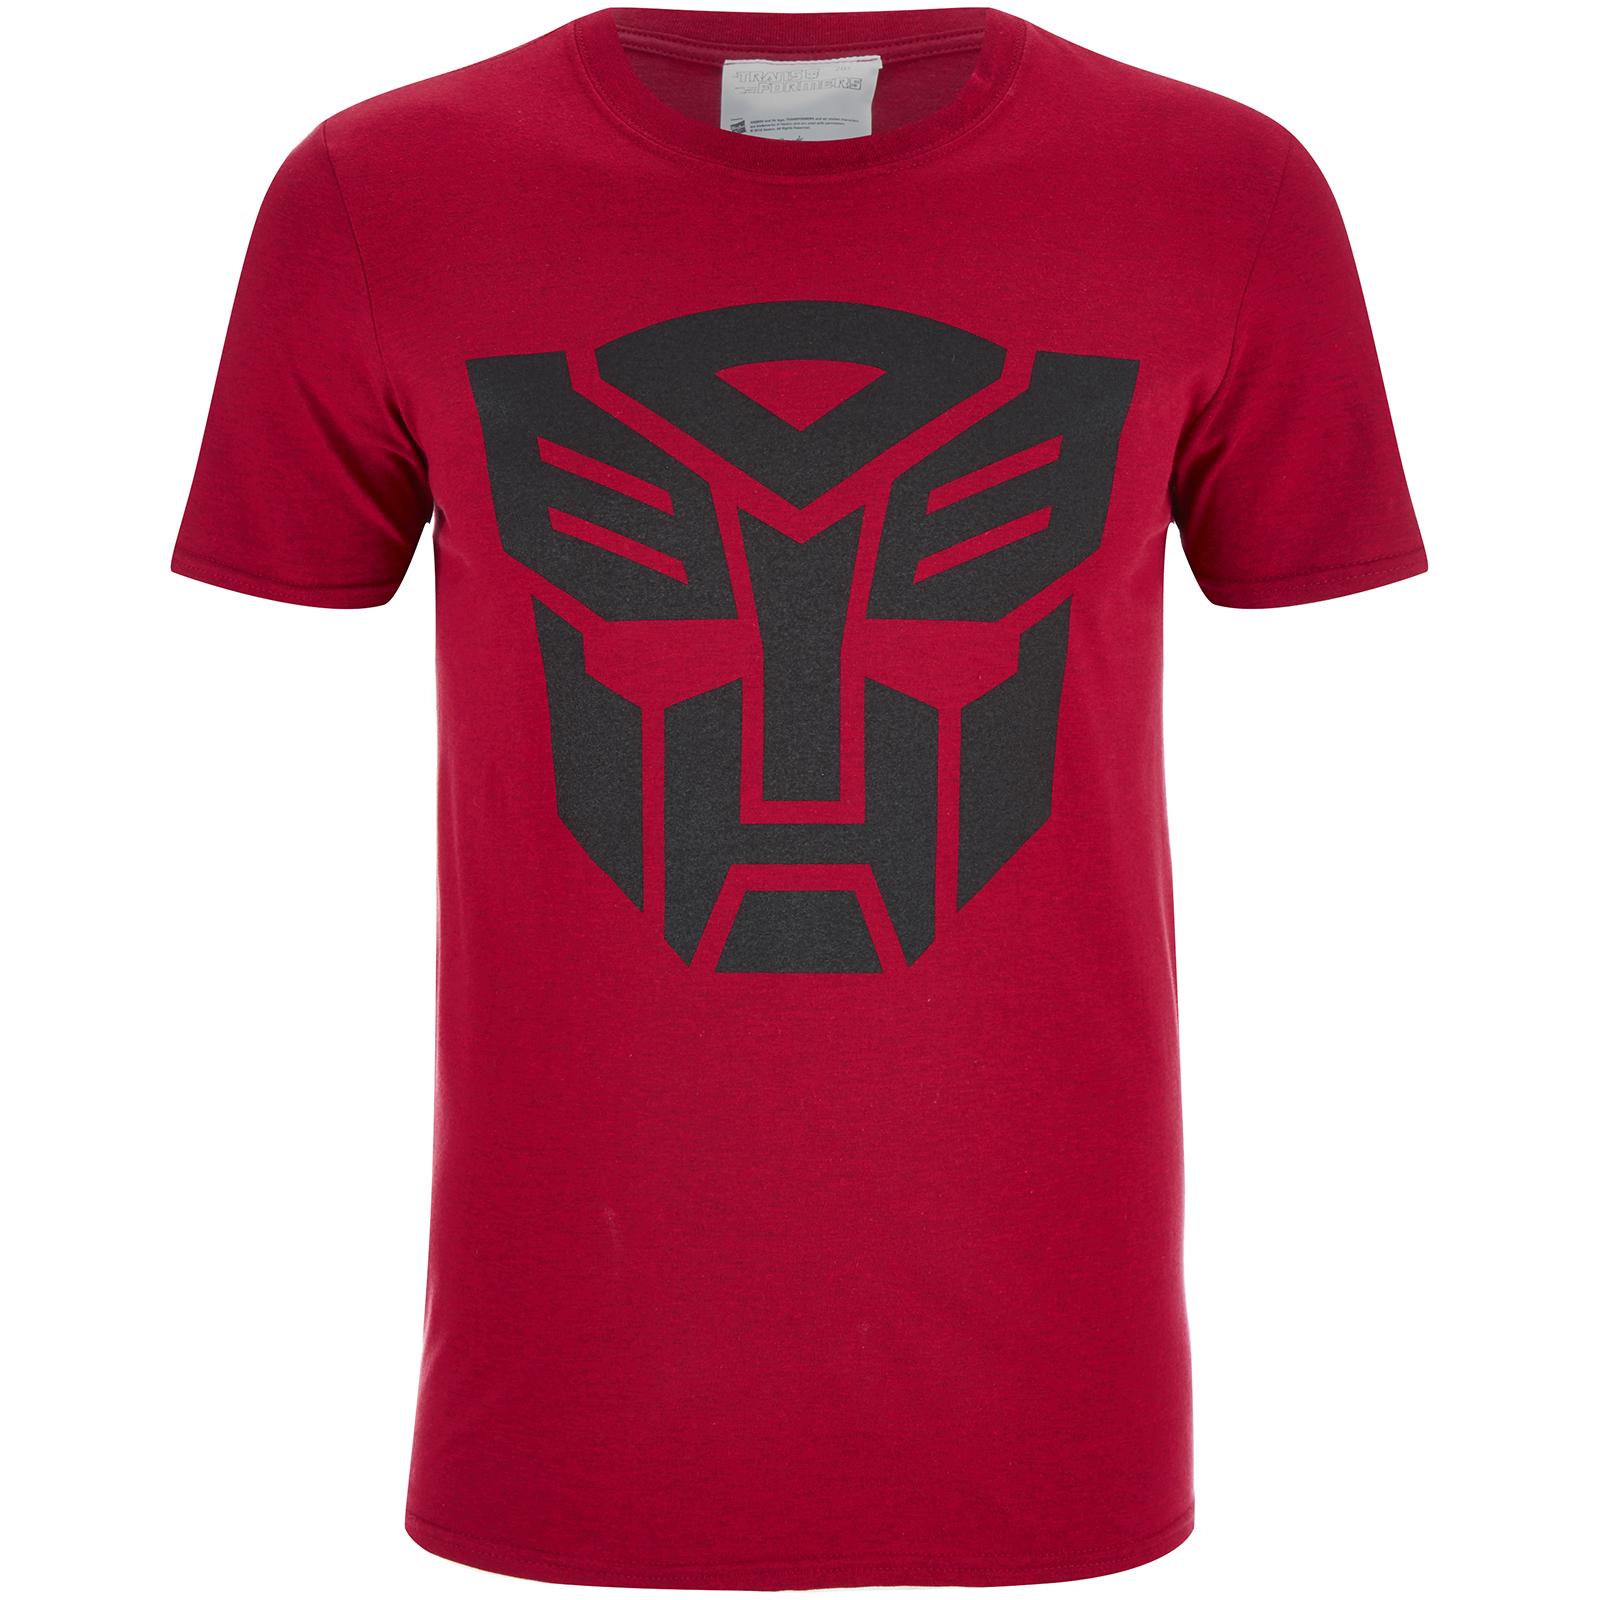 Transformers Men's Transformers Black Emblem T-Shirt - Red - S - Rosso